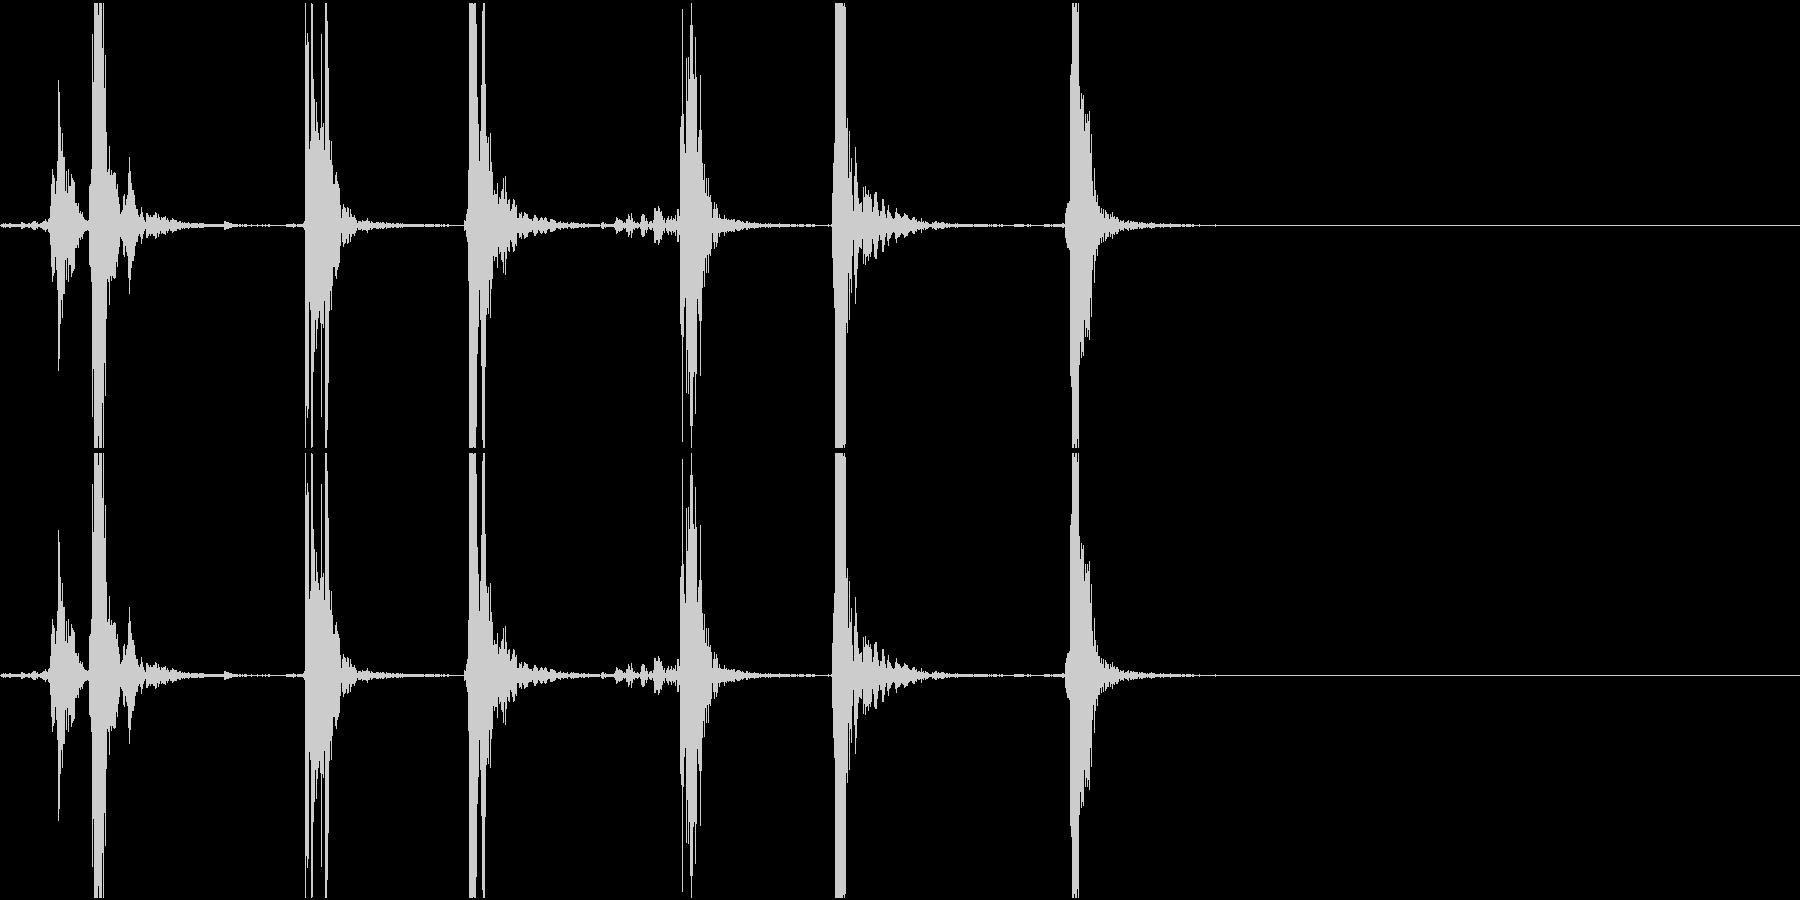 Typing キーボード 3連打音 PCの未再生の波形